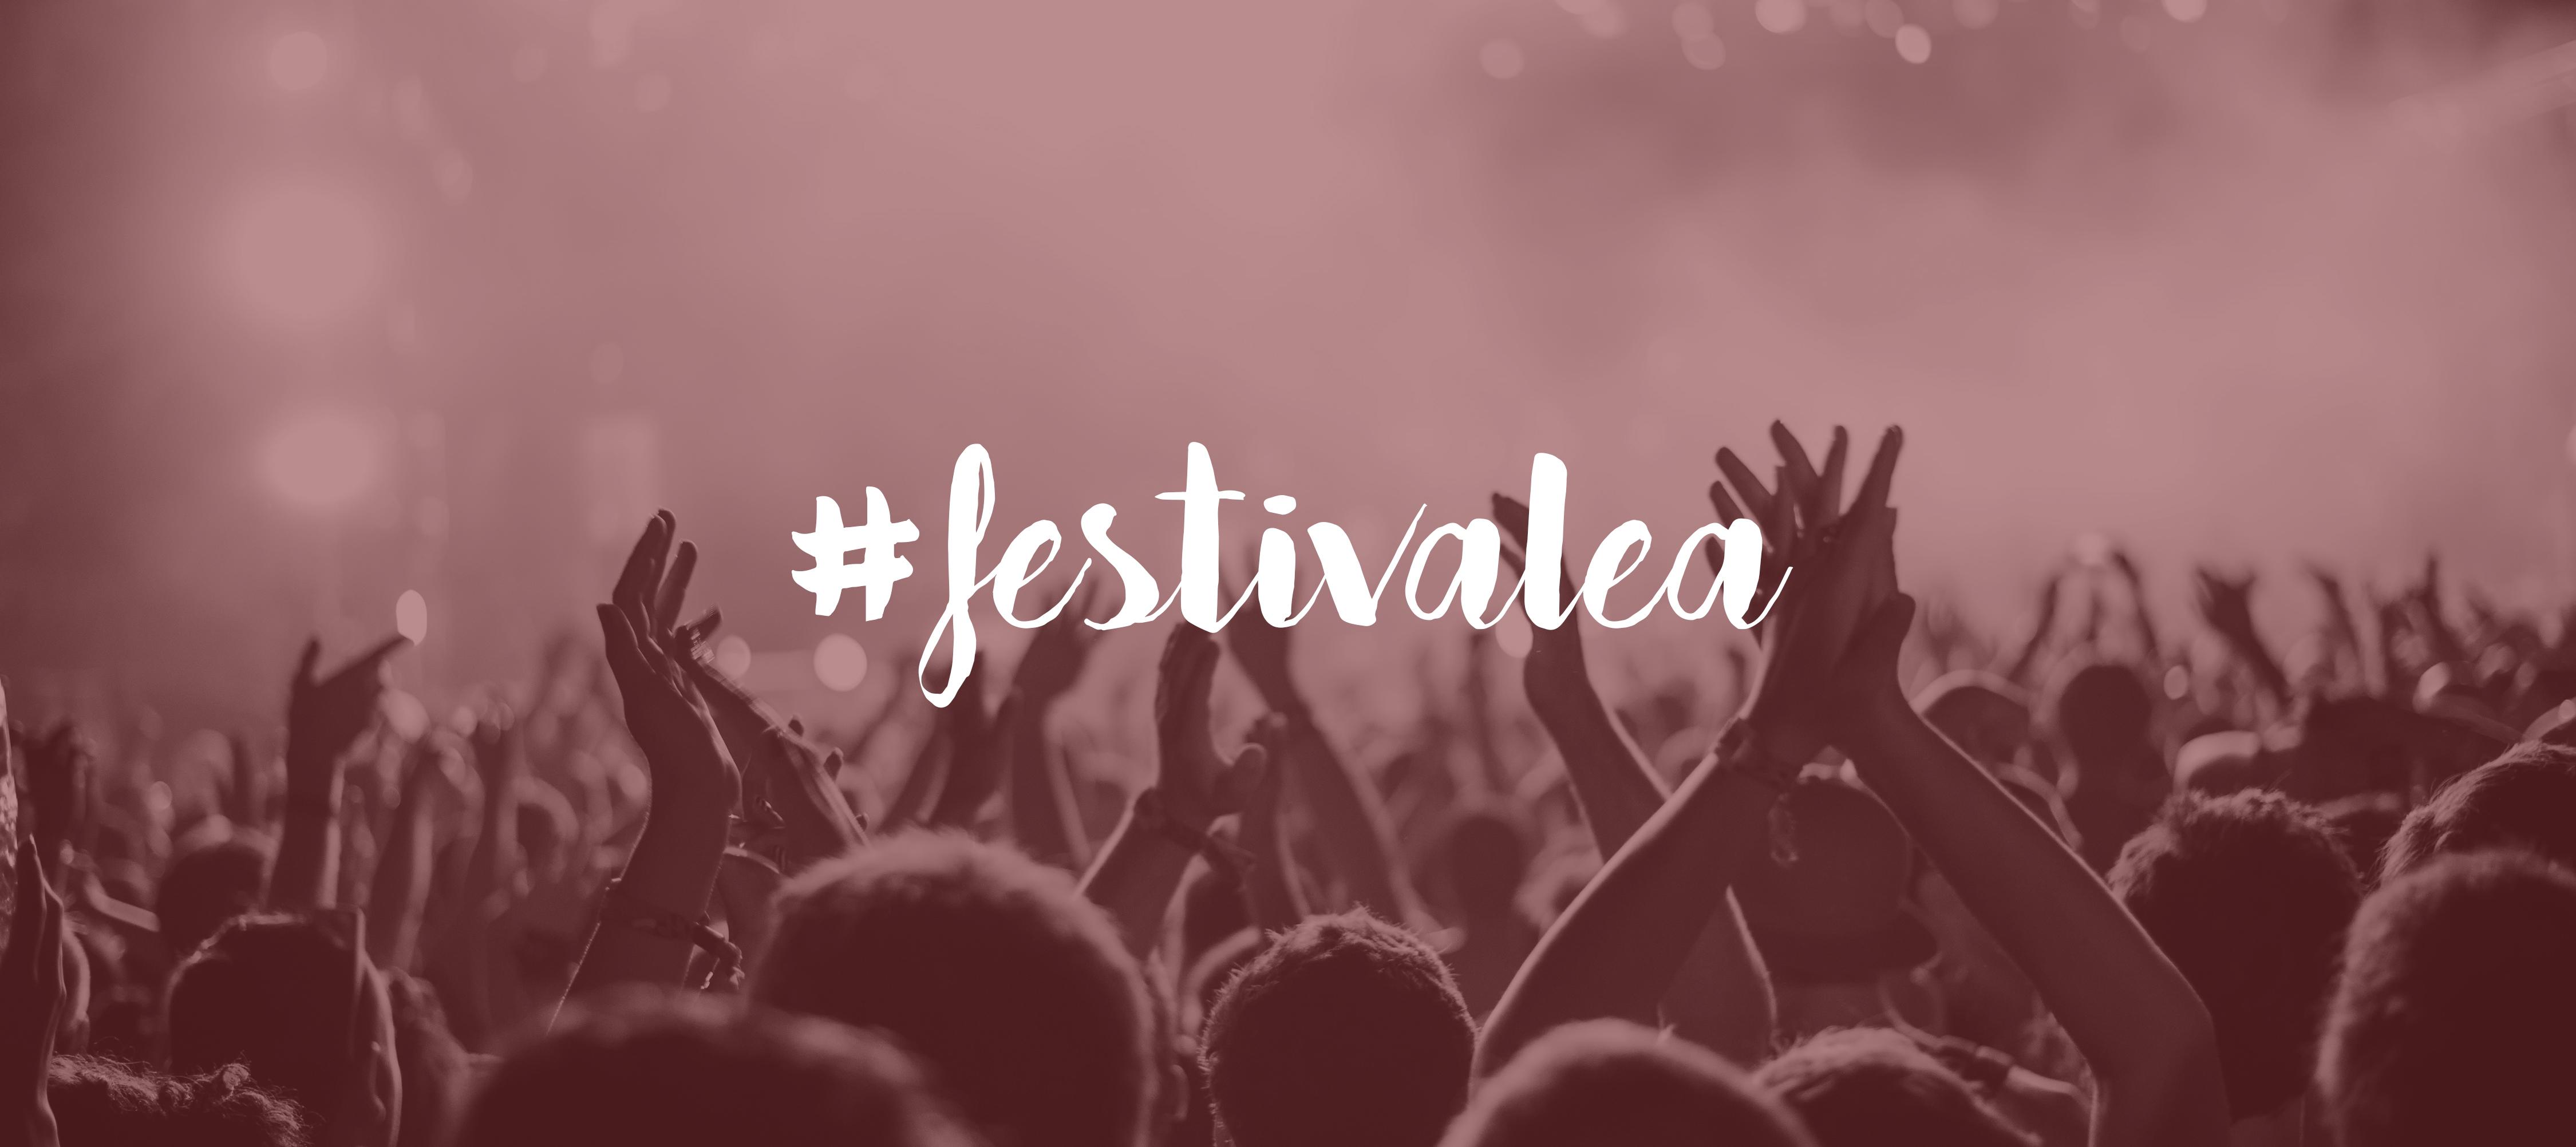 mejores-festivales-chollo